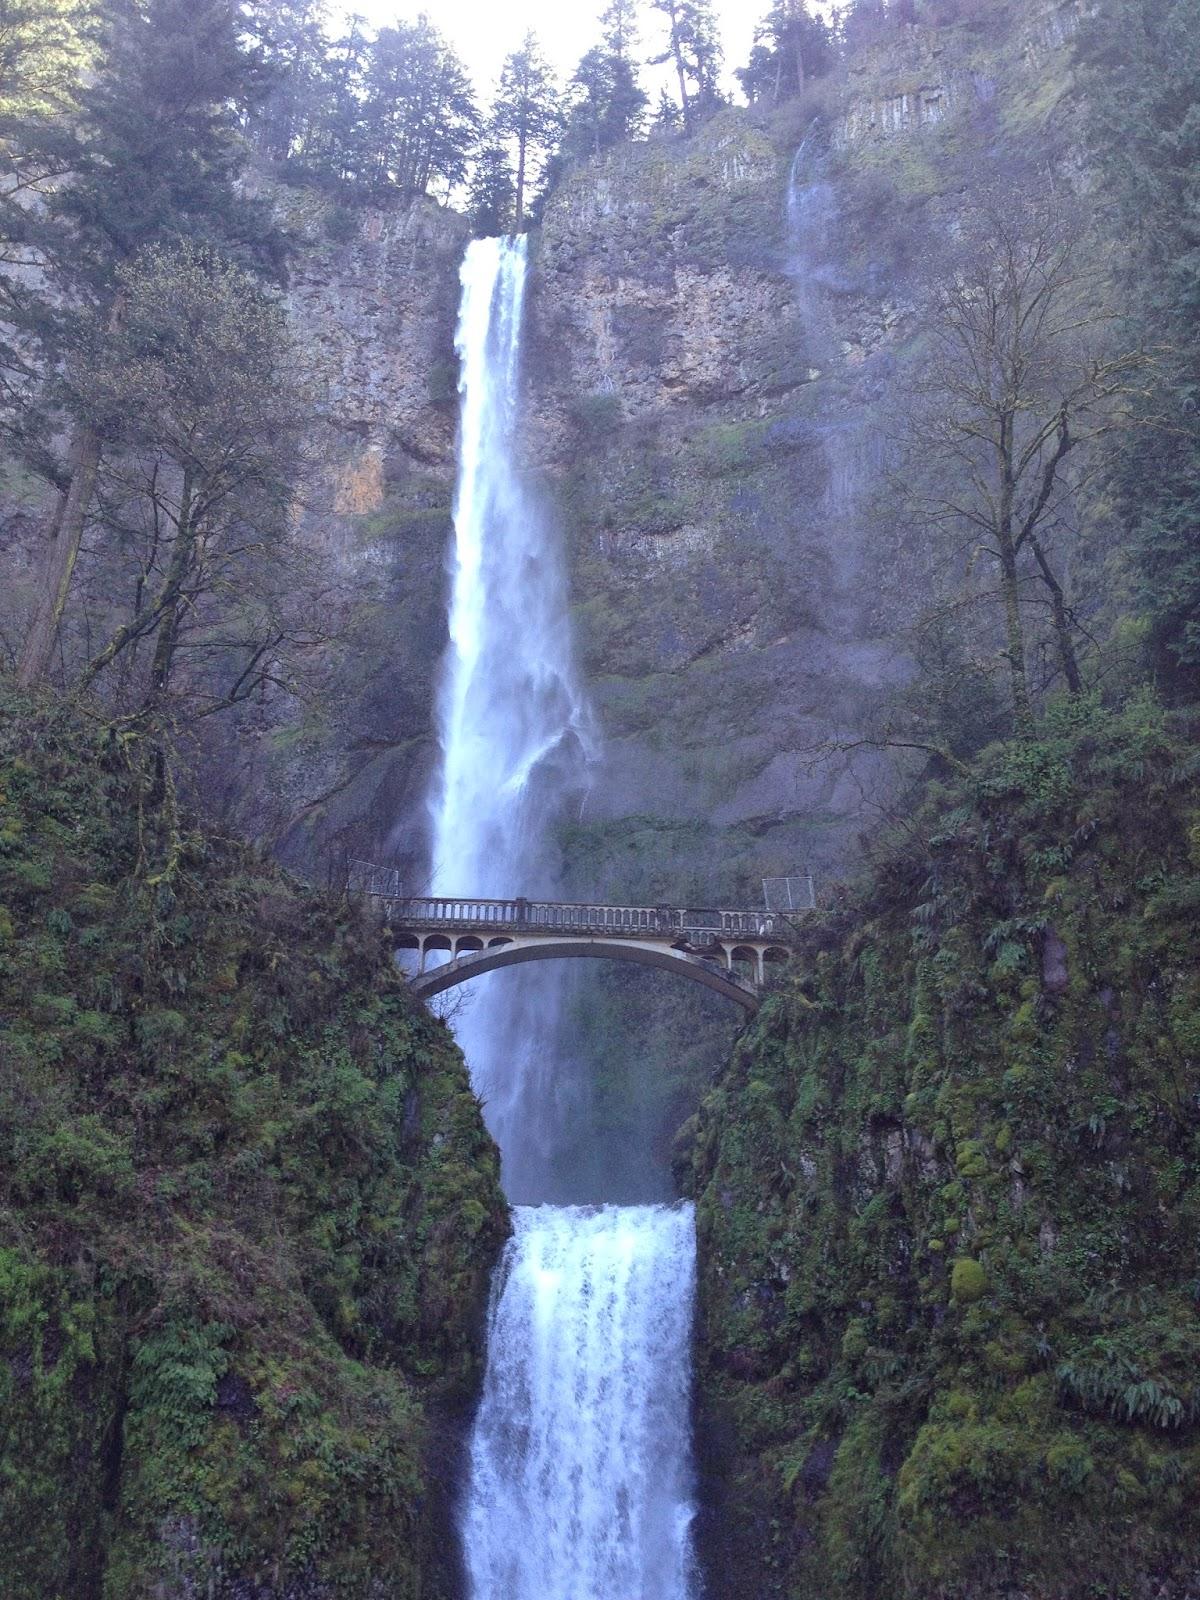 multnomah falls, water falls oregon, beautiful waterfalls